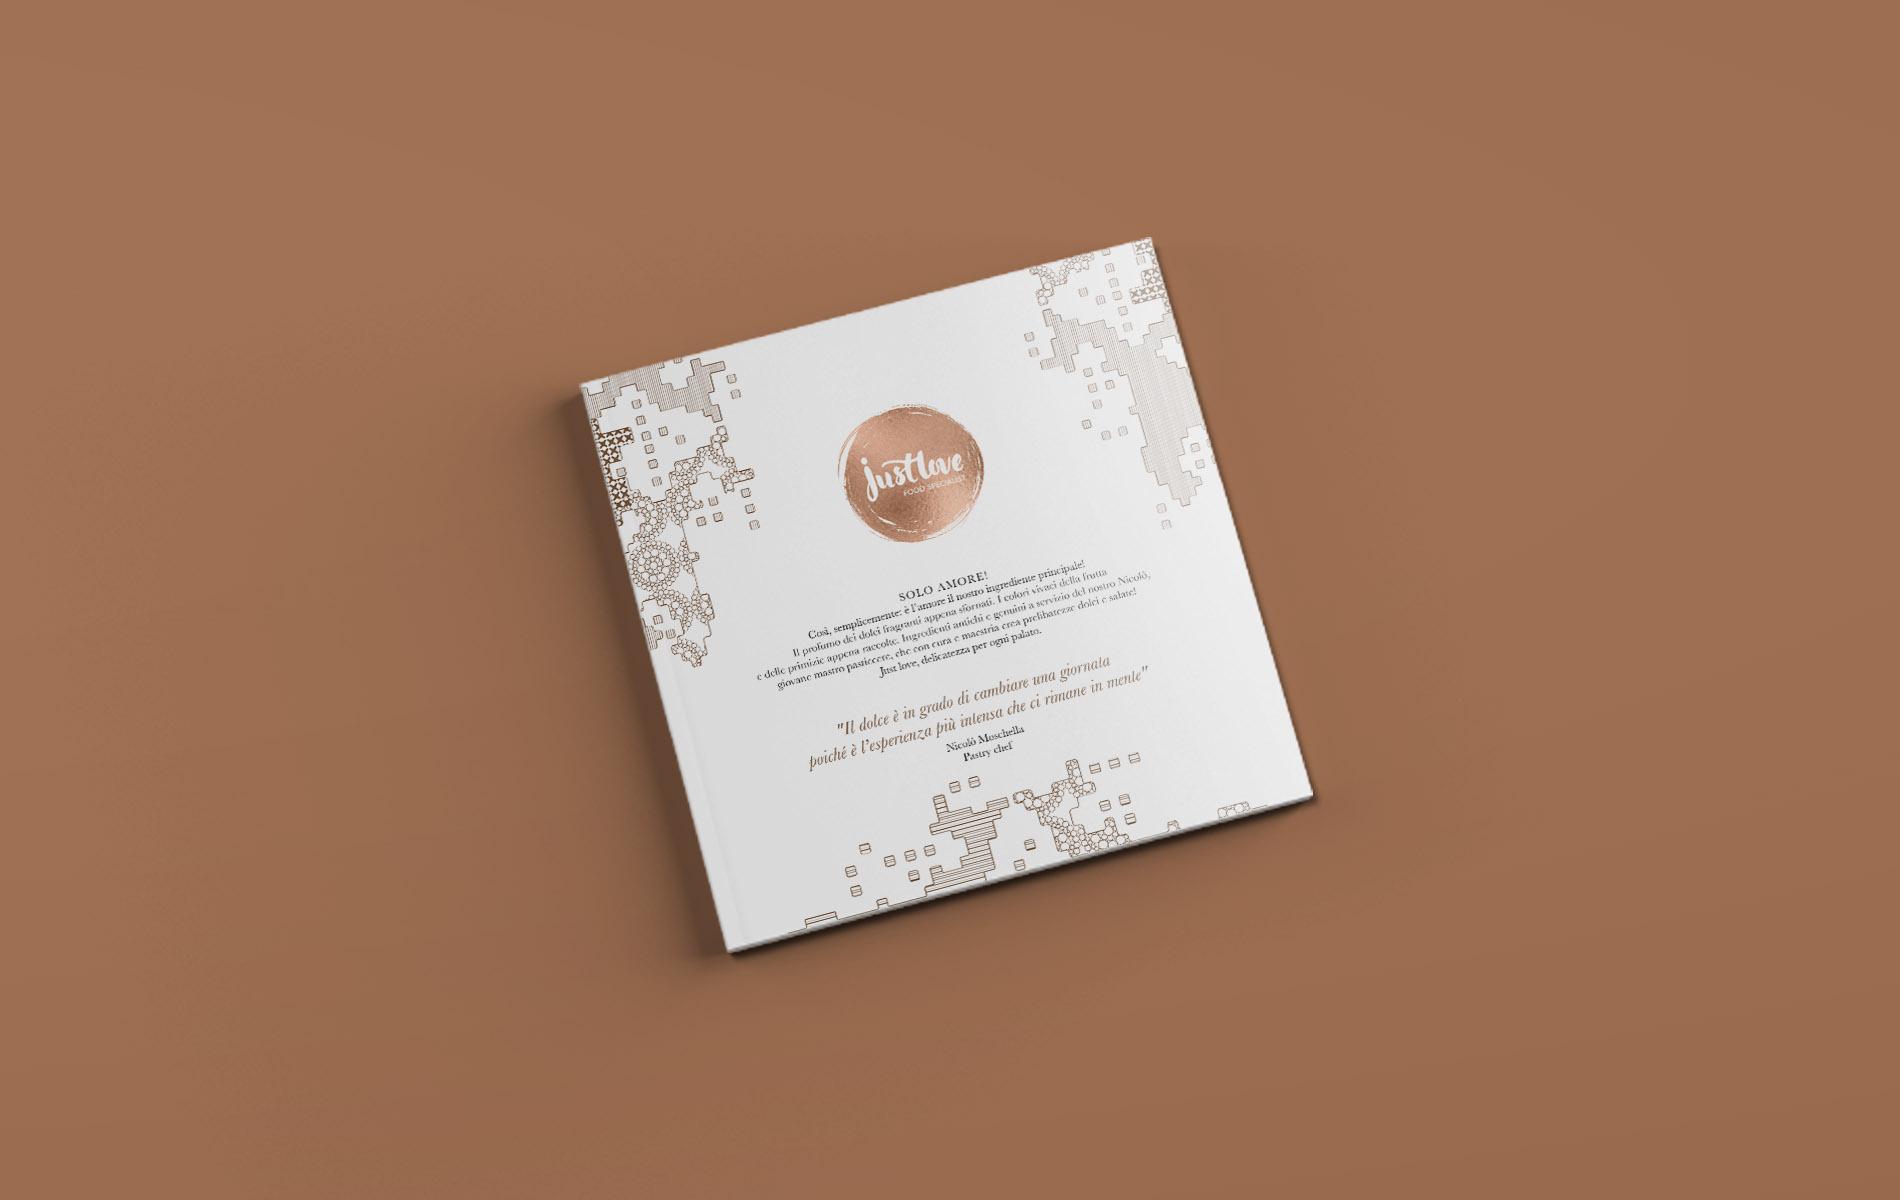 mintlab-brandidentity-justlove-mockup-menucover